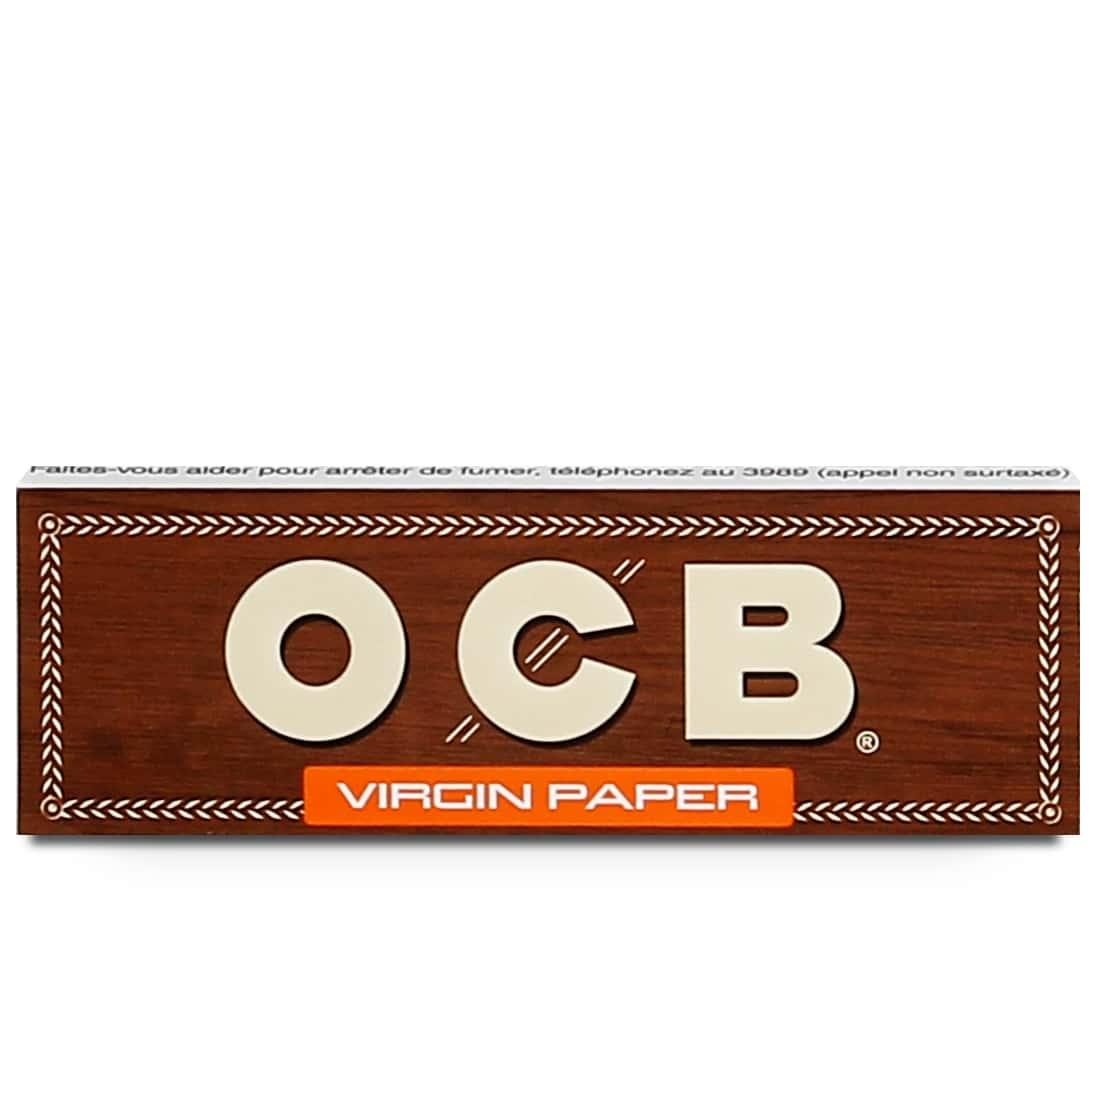 Photo #2 de Papier a rouler OCB Virgin 1 1/4 x 1